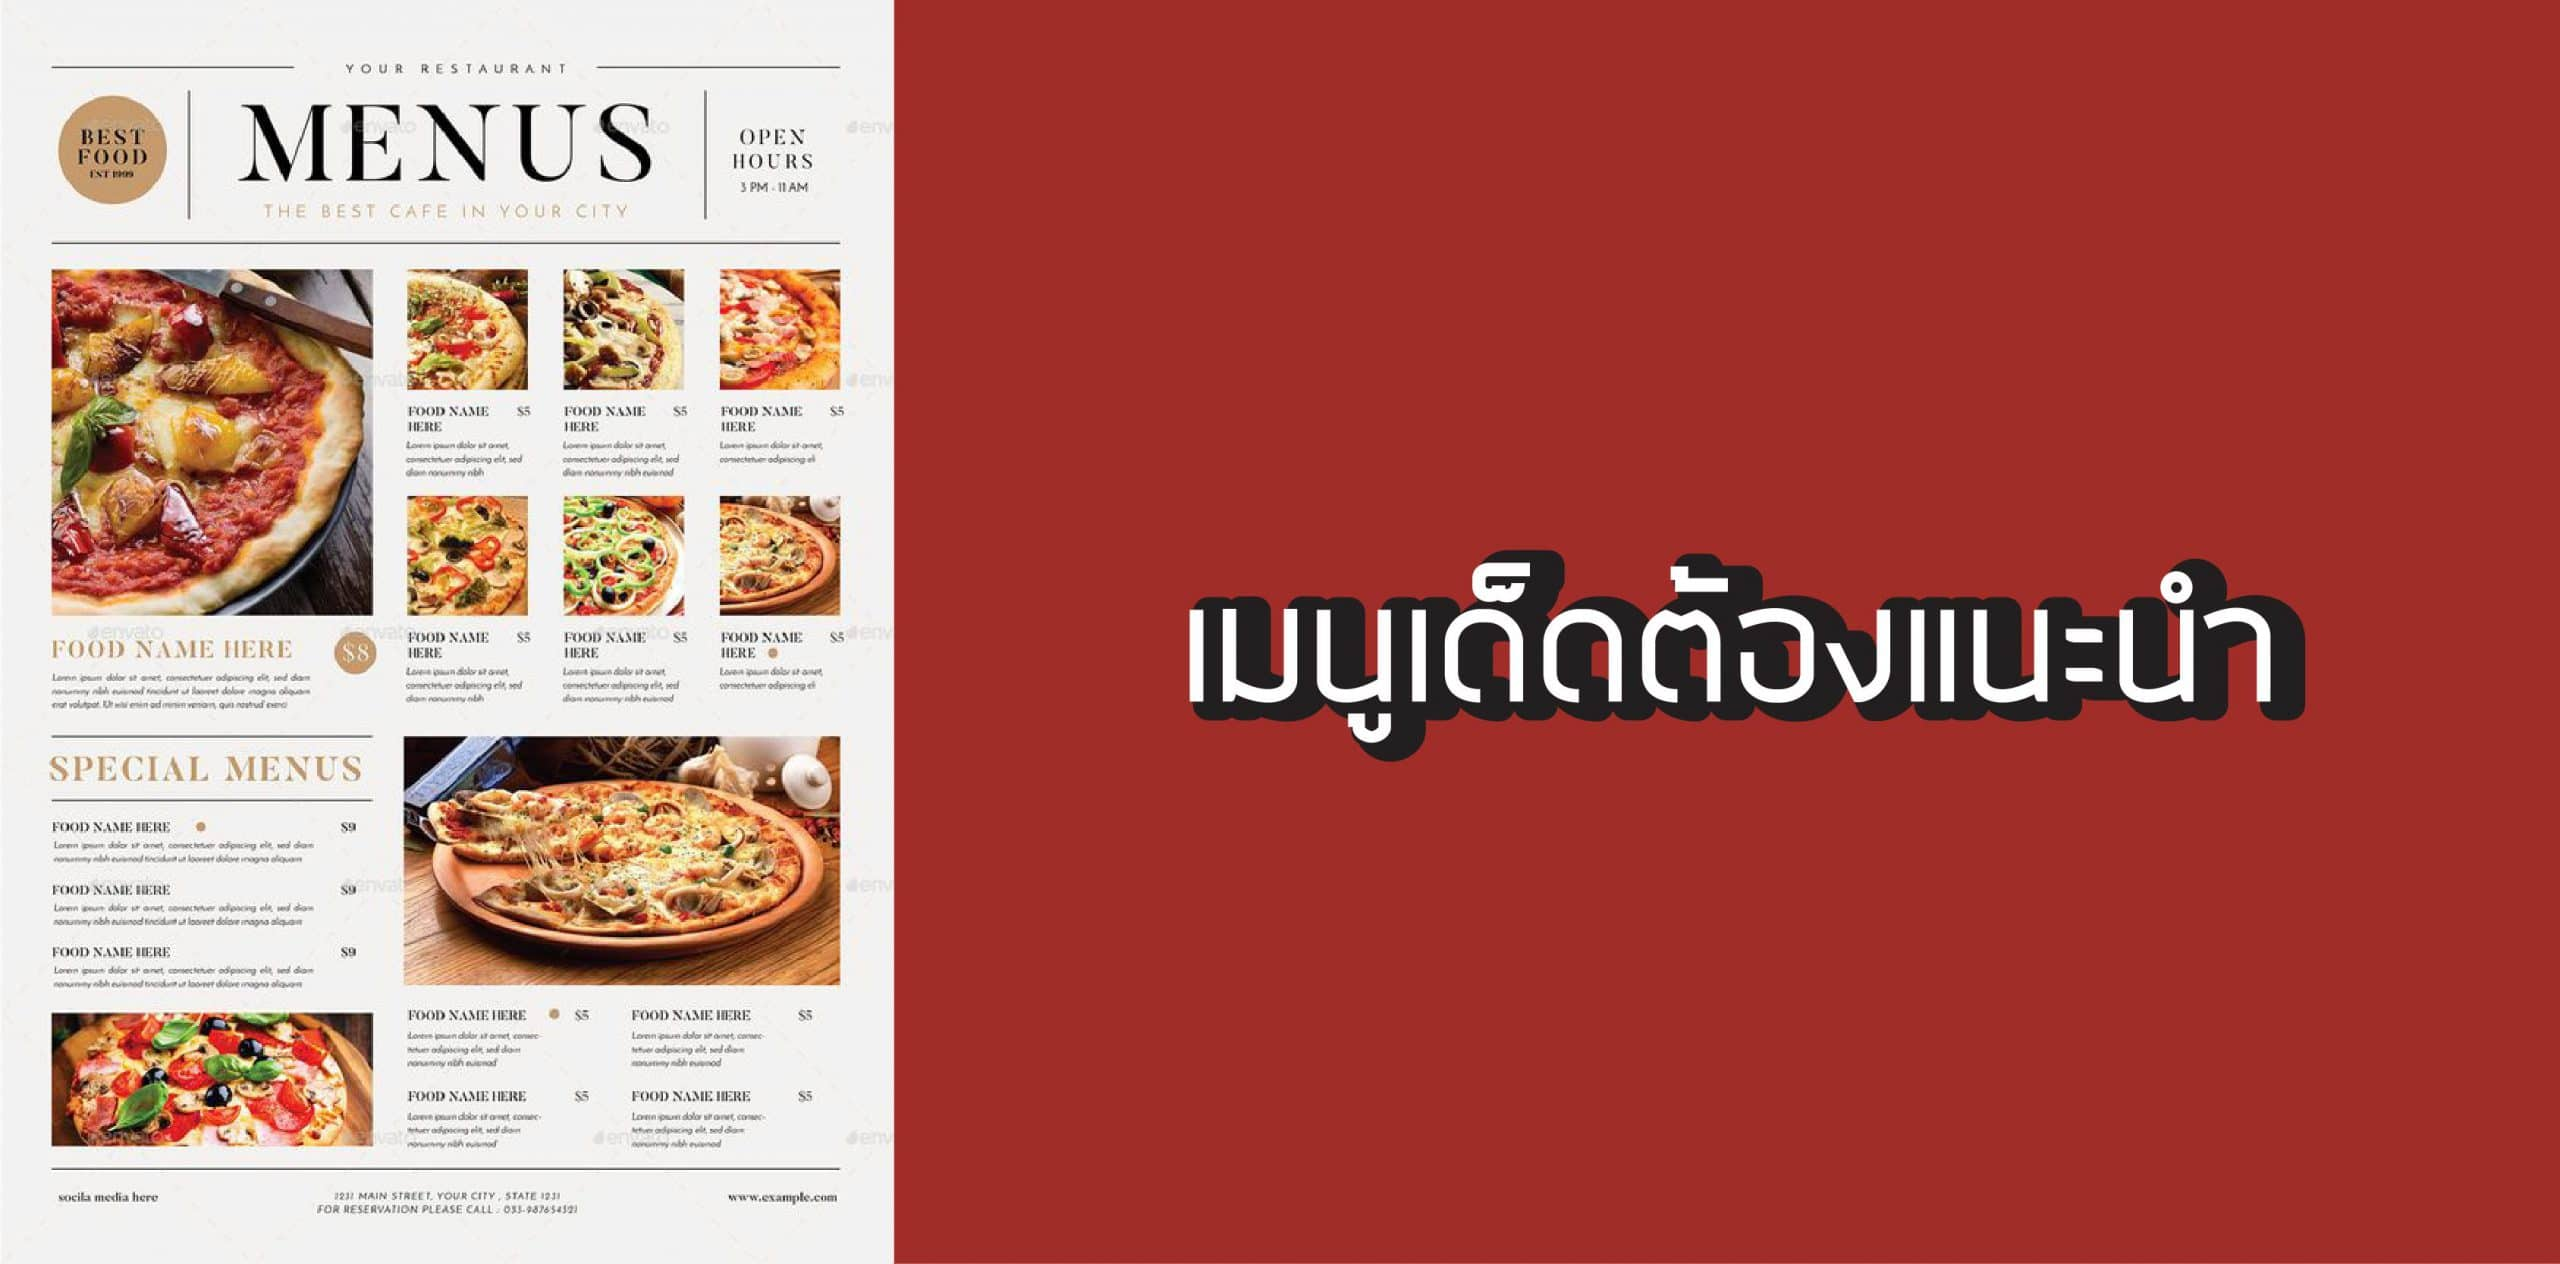 Website menu 03 scaled - เทคนิคการออกแบบเมนูอาหารให้ดูโดดเด่น